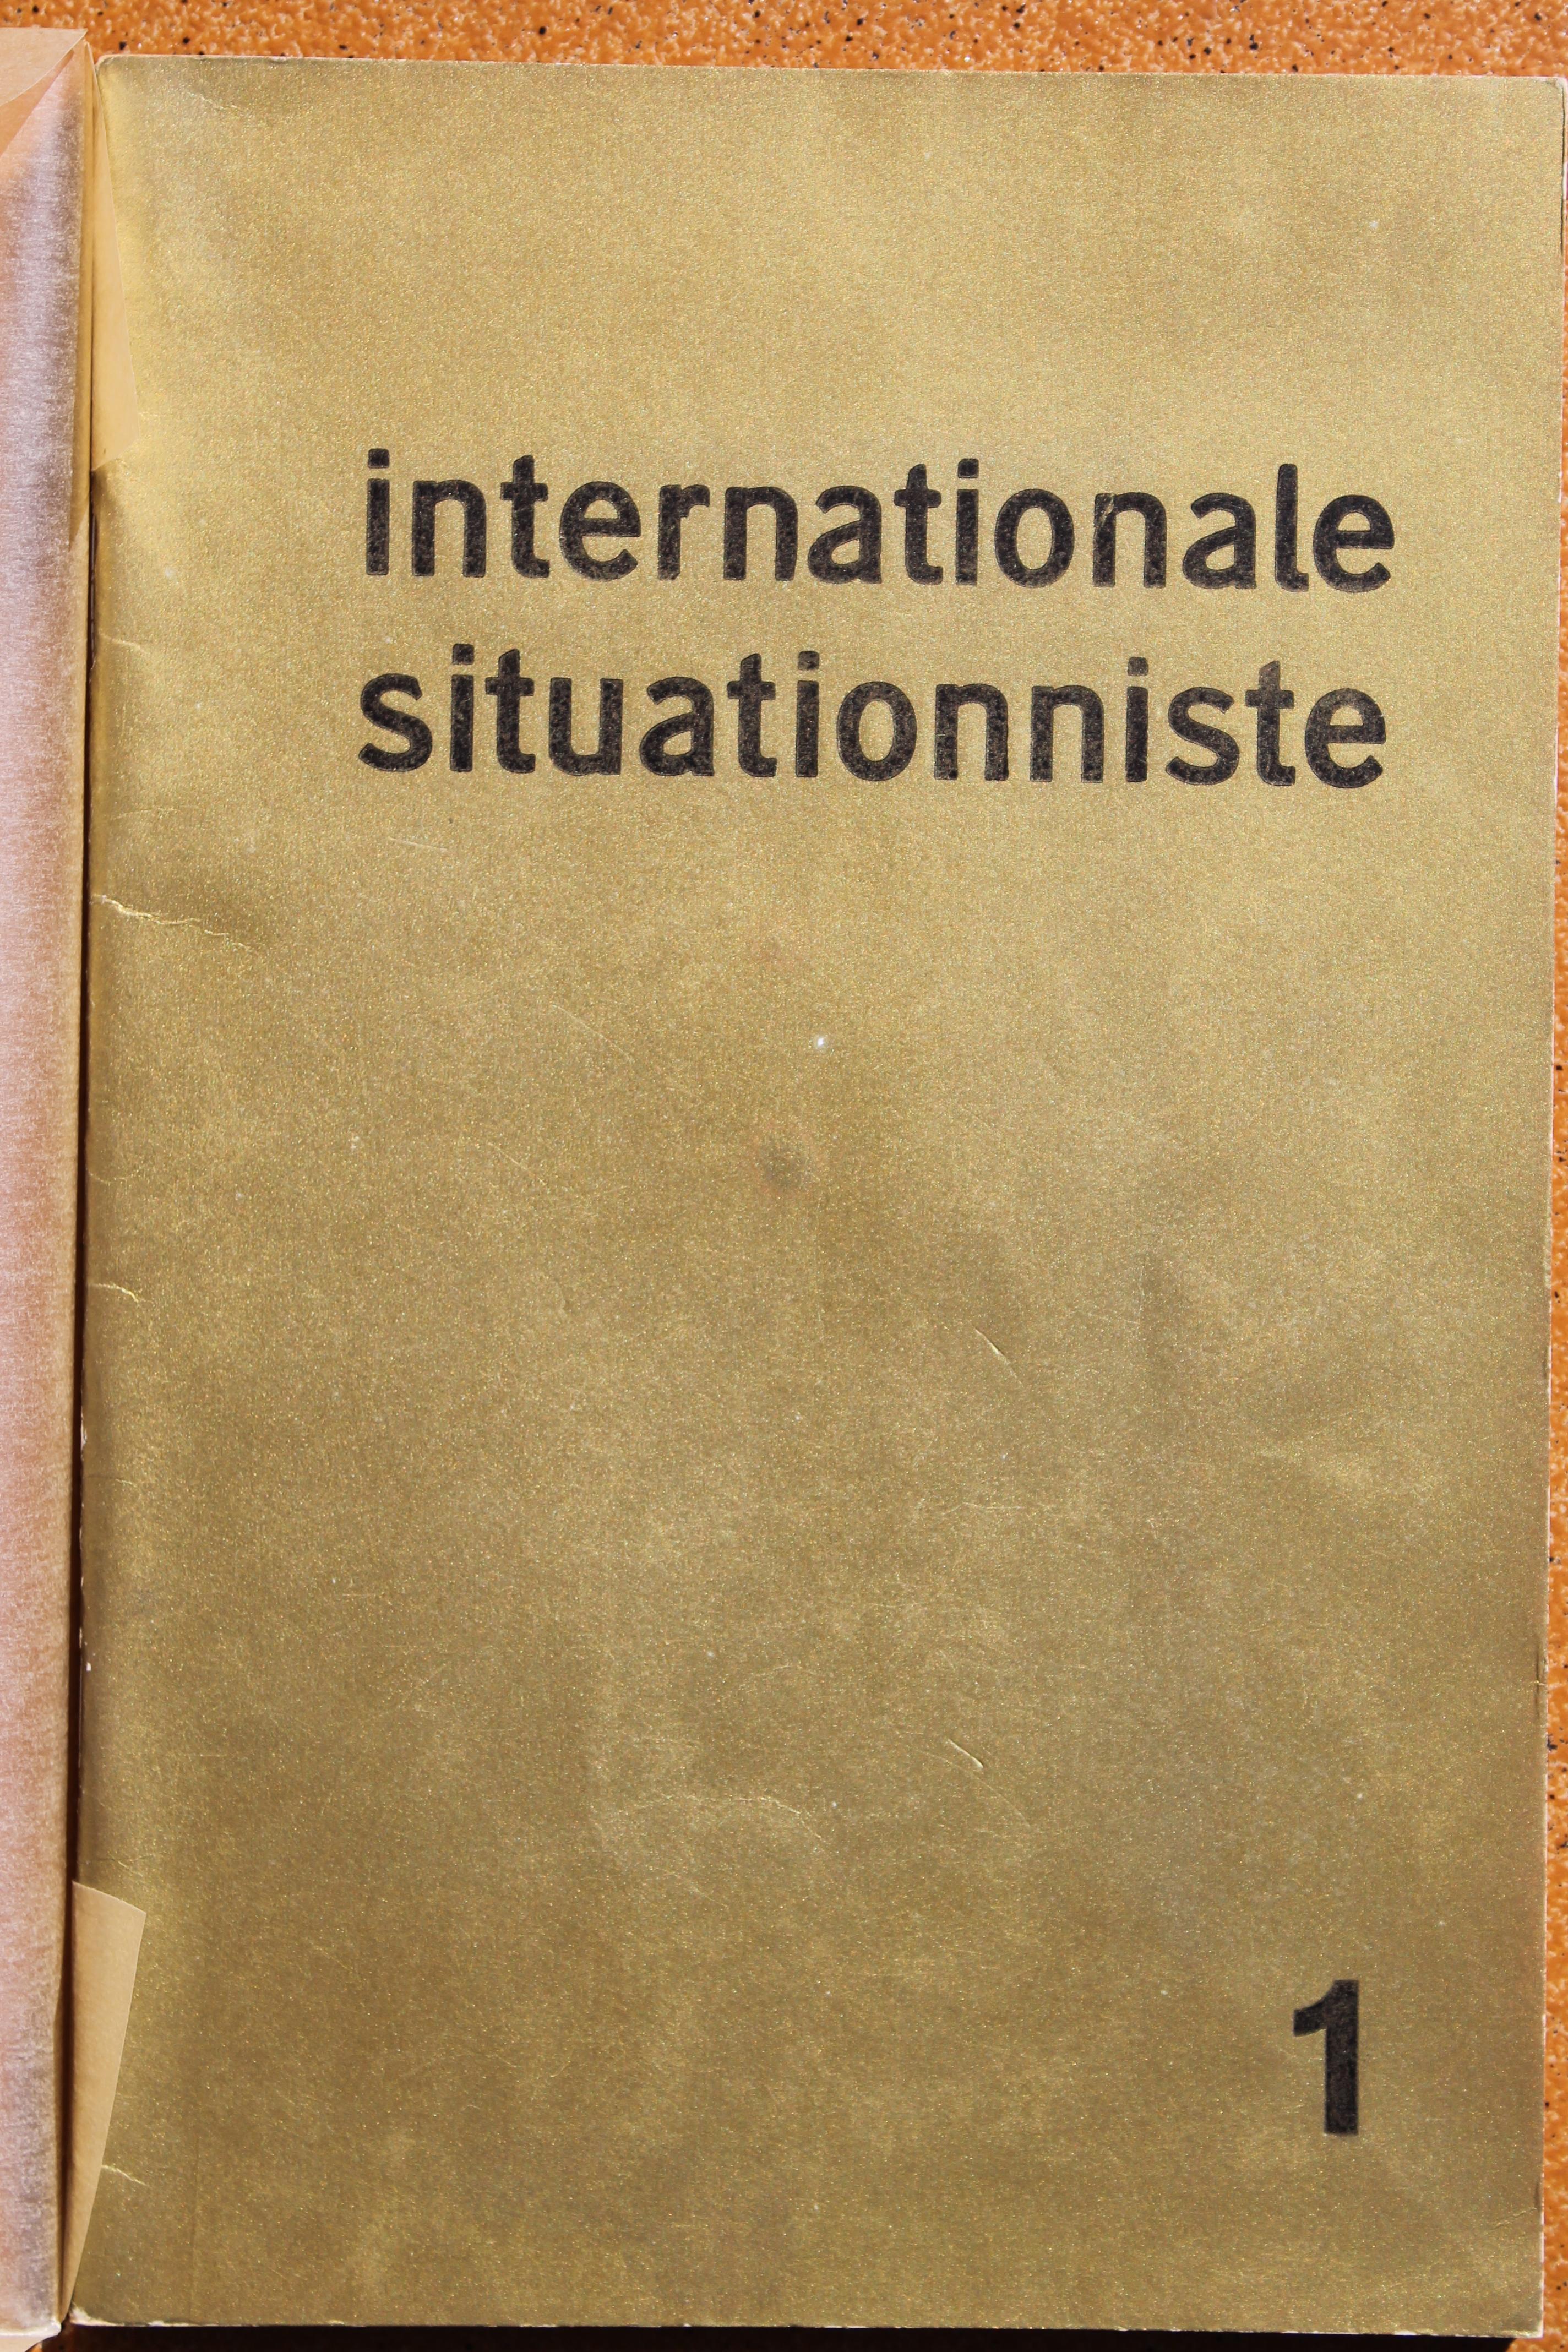 Situationist International - Wikiwand